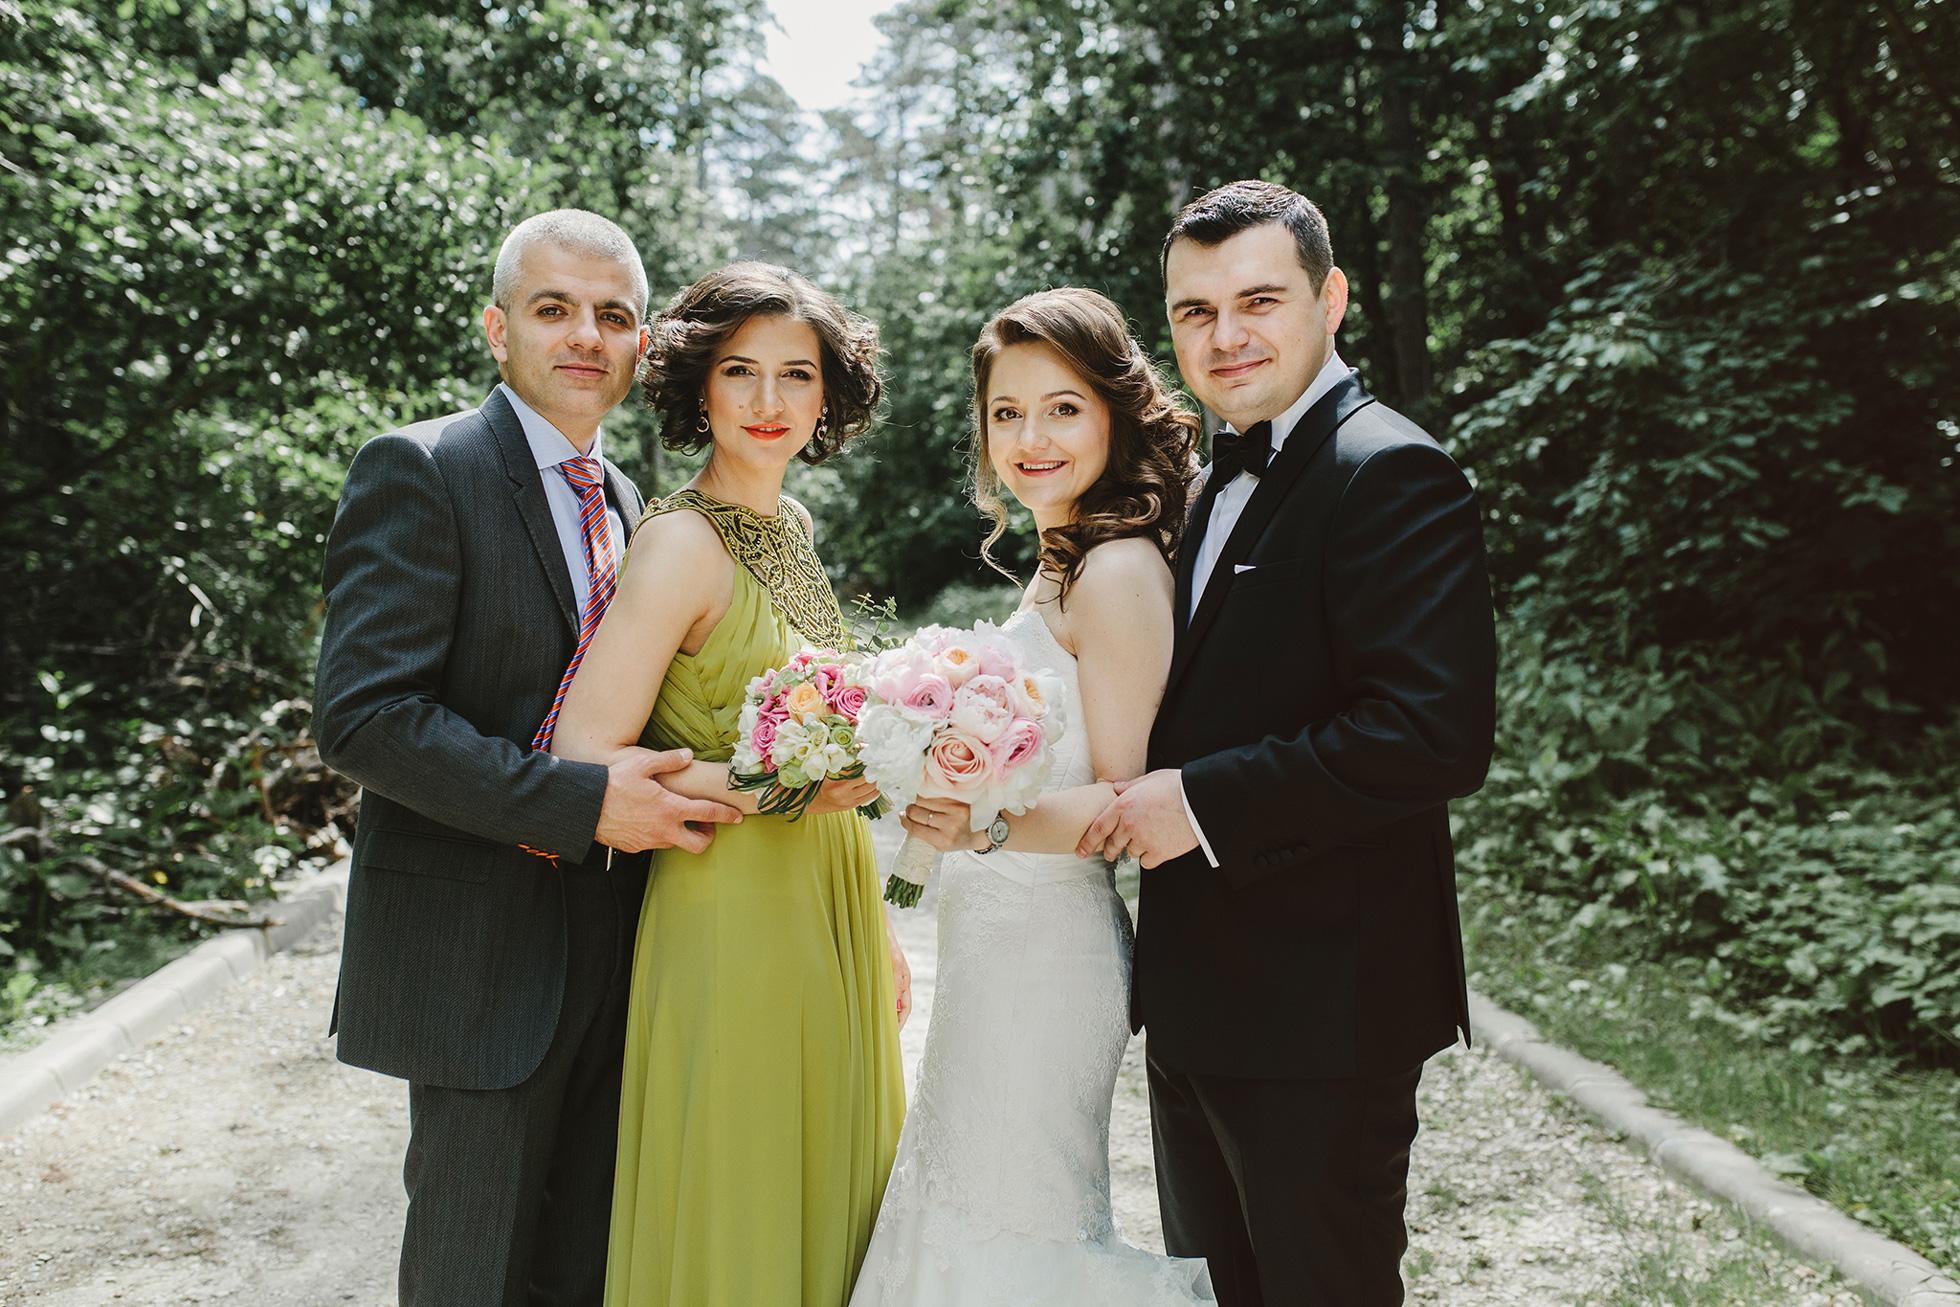 Liana-+-Florin-{wedding}-061